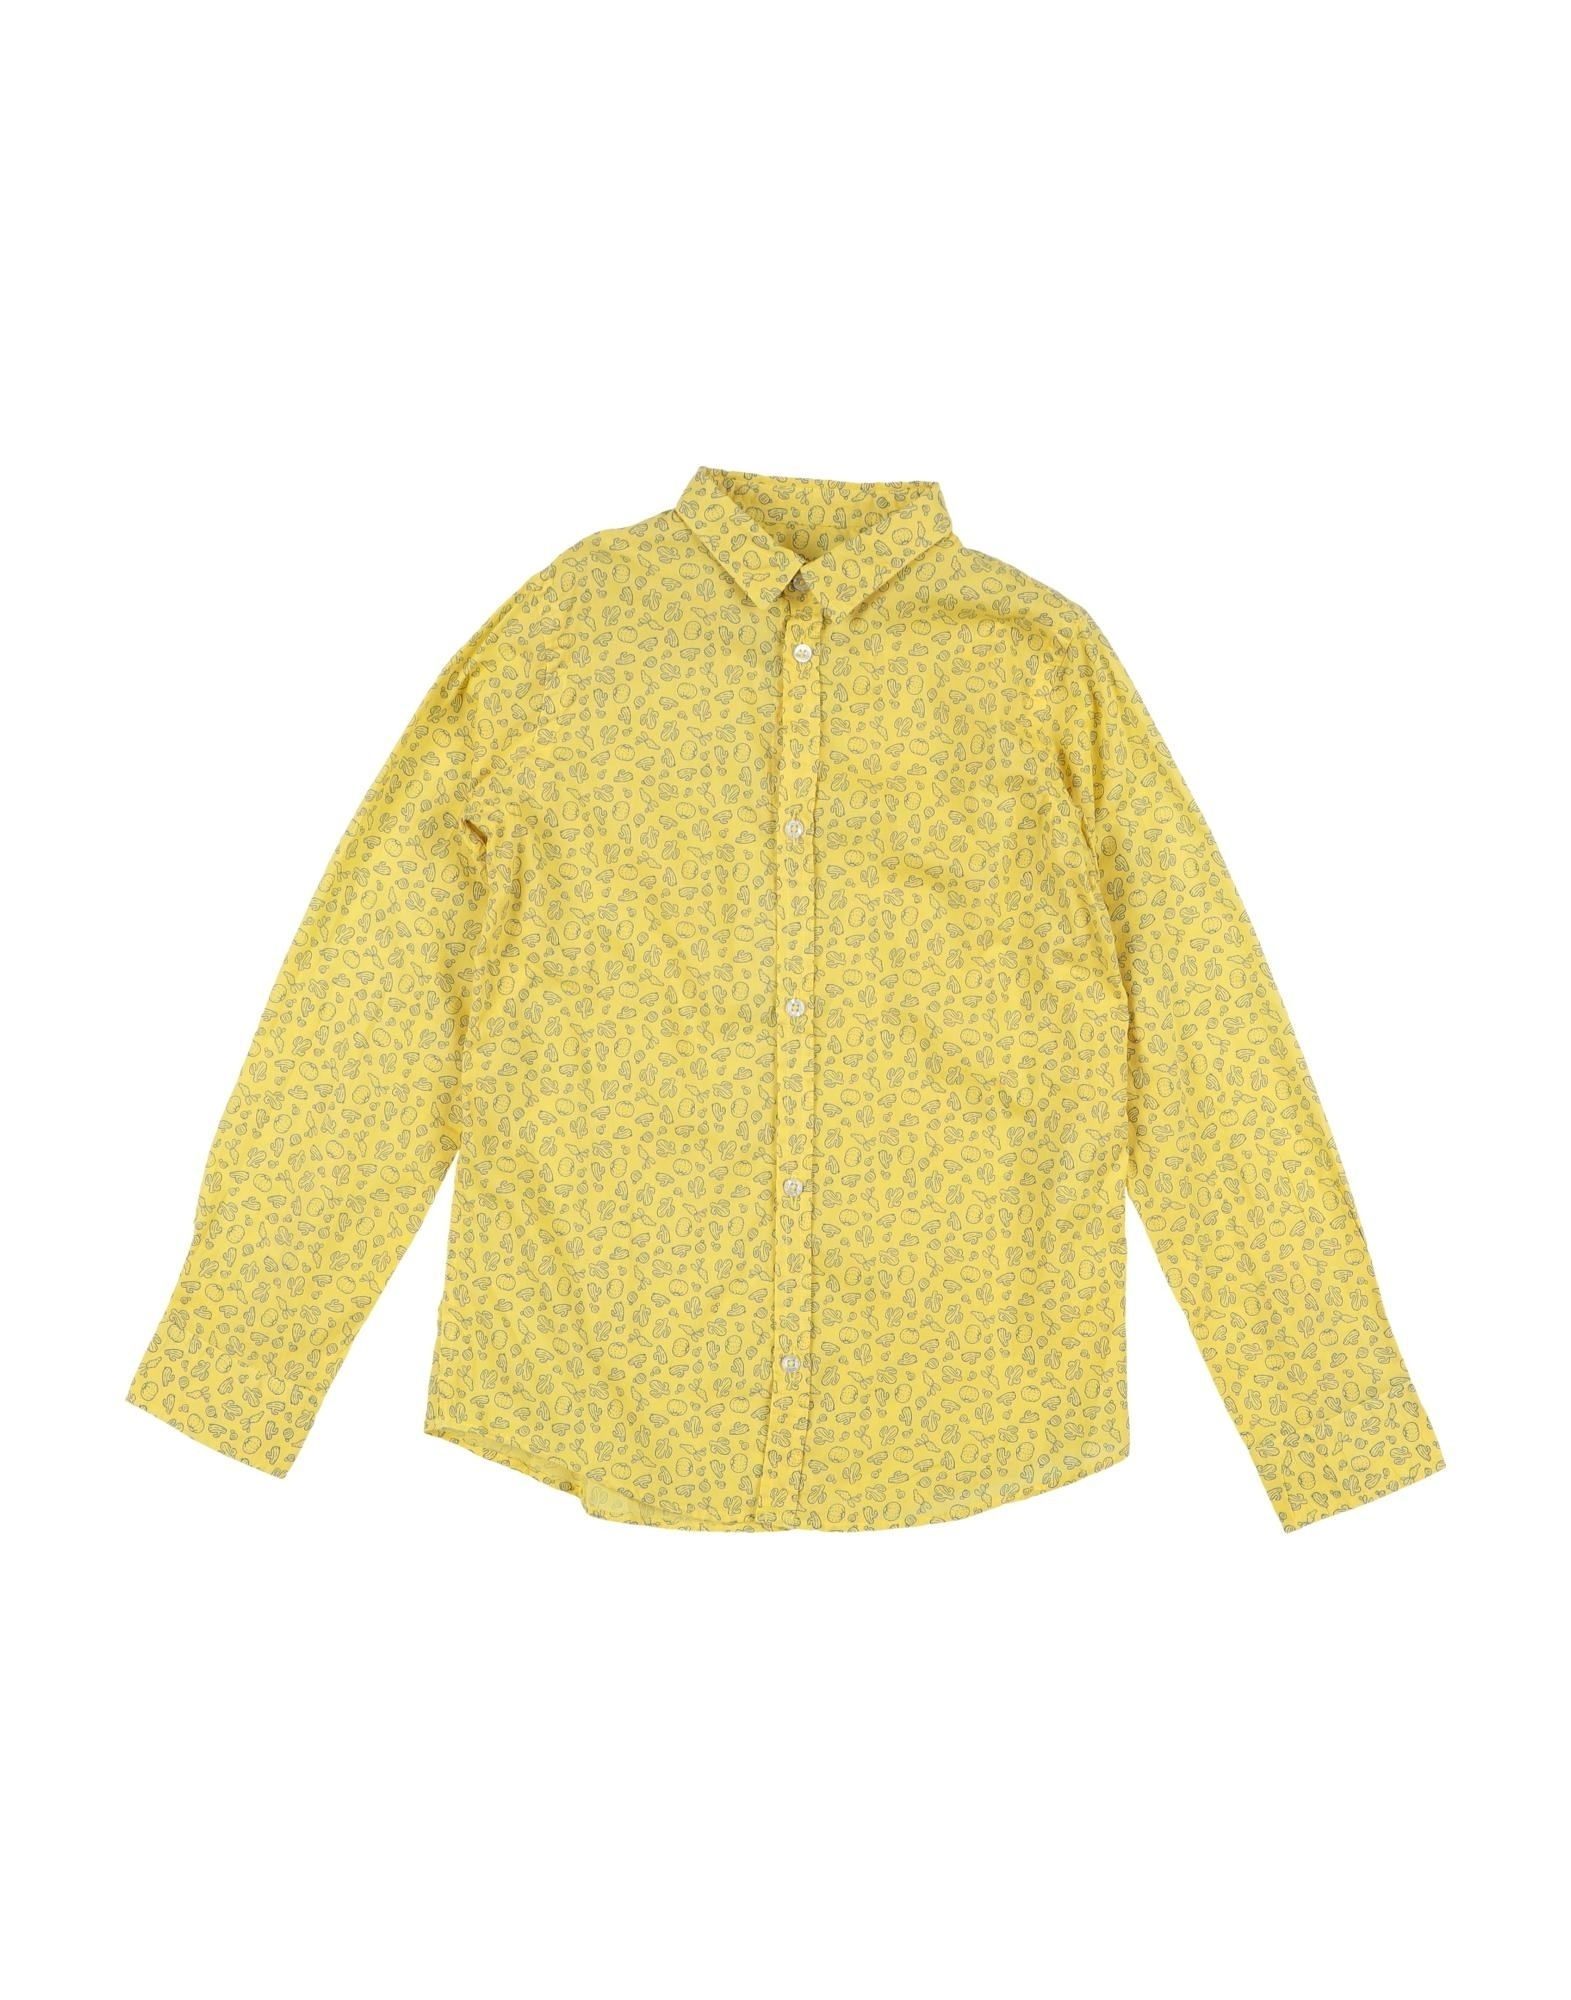 Gas Kids' Shirts In Yellow